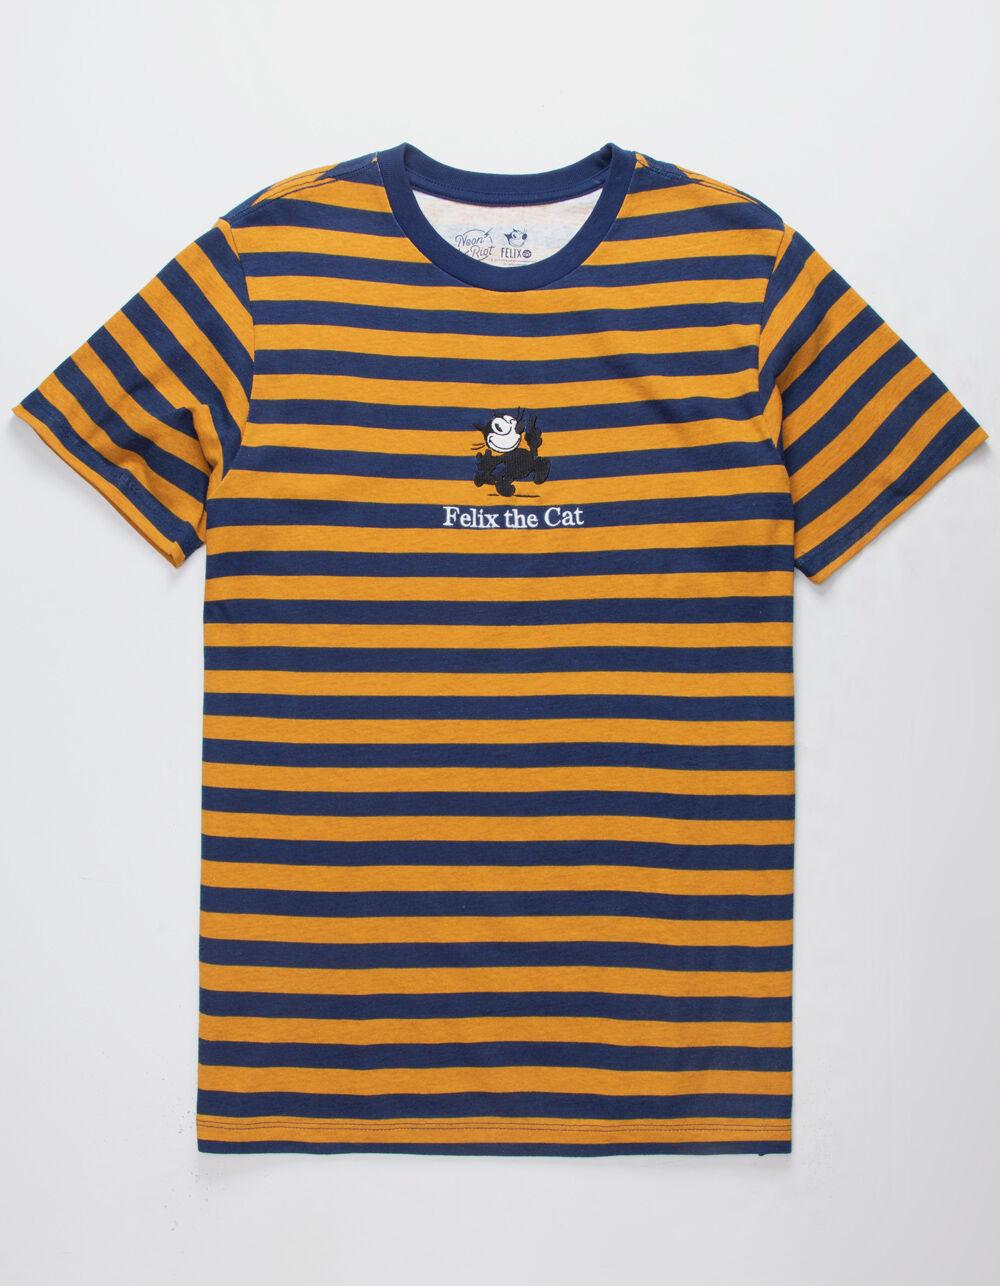 NEON RIOT Felix Wink Navy Stripe T-Shirt